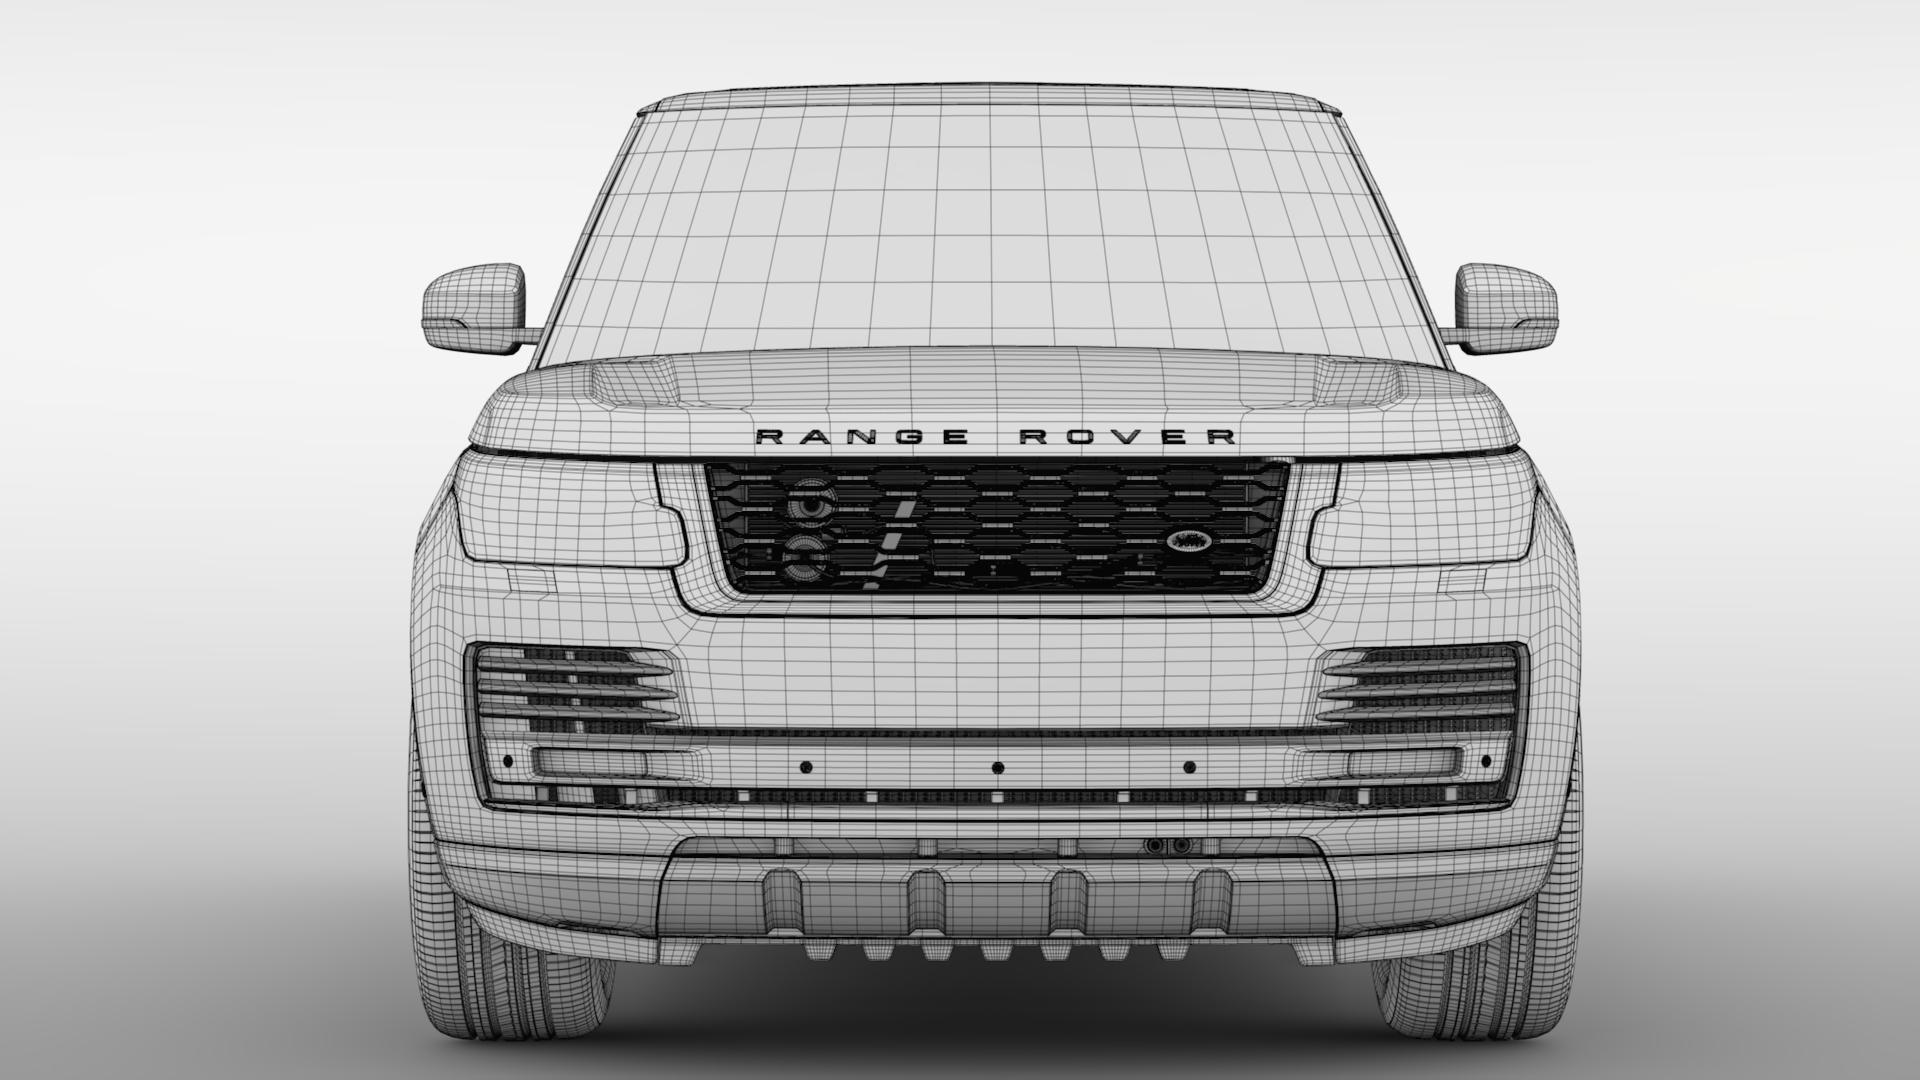 range rover autobiography lwb l405 2018 3d model max fbx c4d lwo ma mb hrc xsi obj 277341